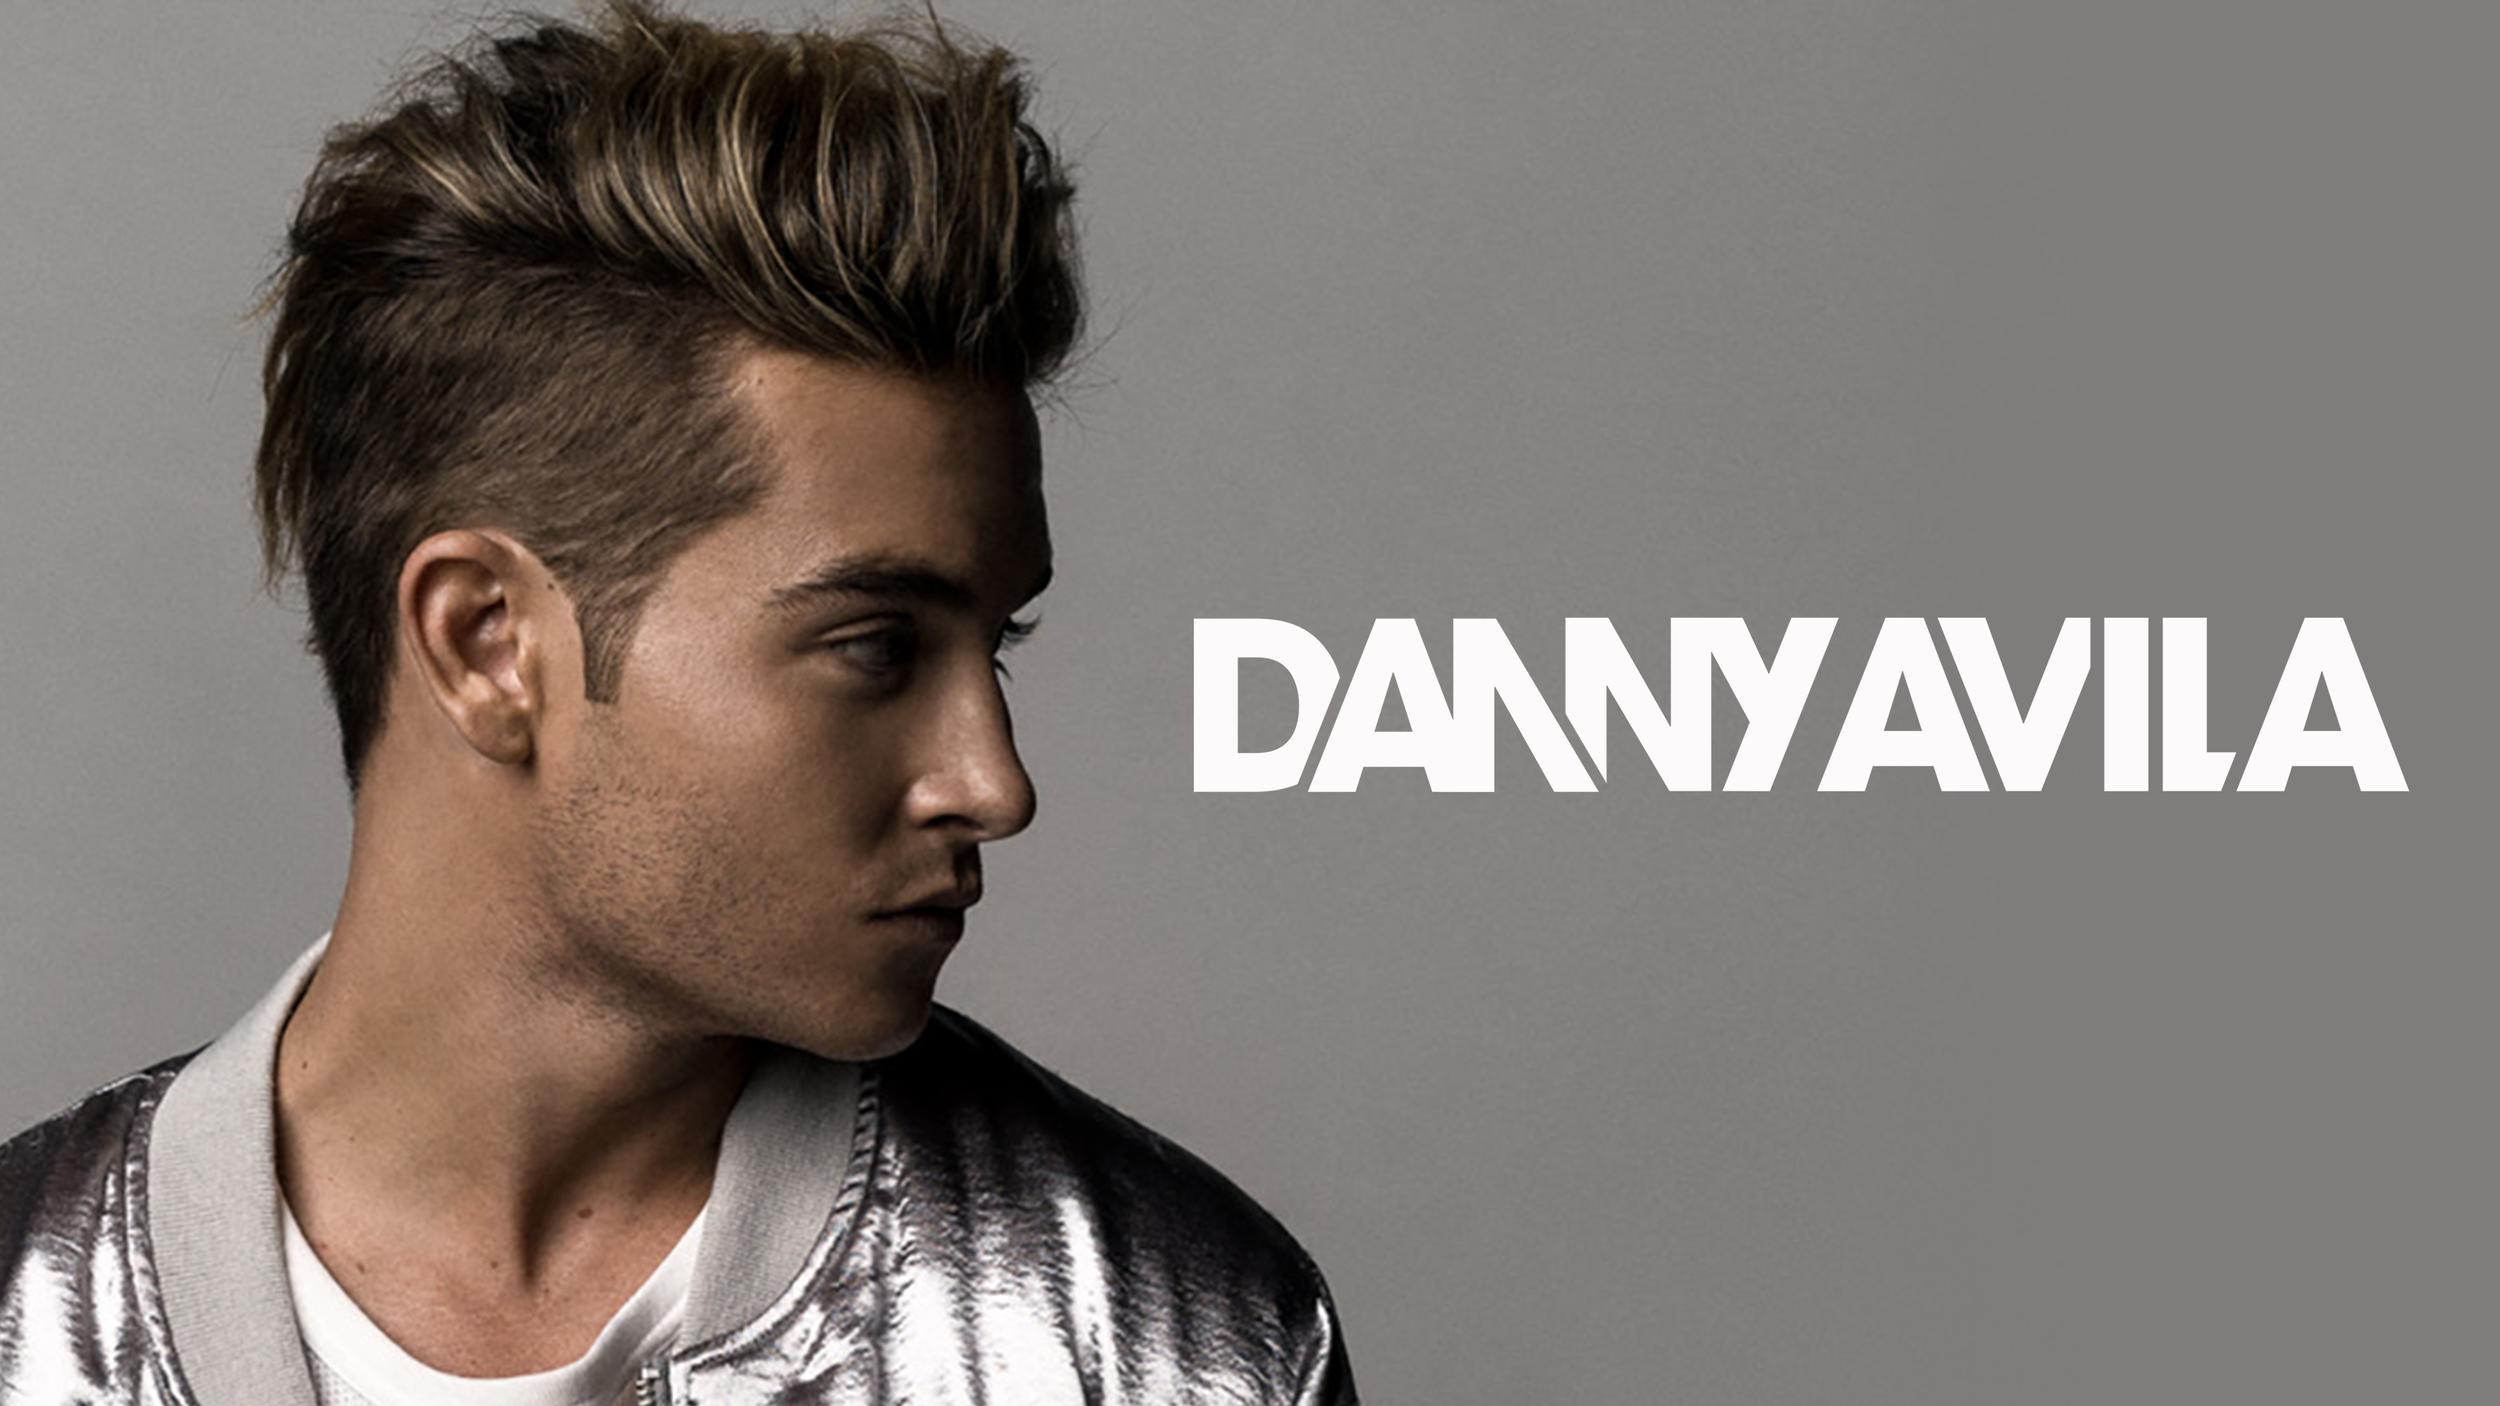 Danny-Avila.png